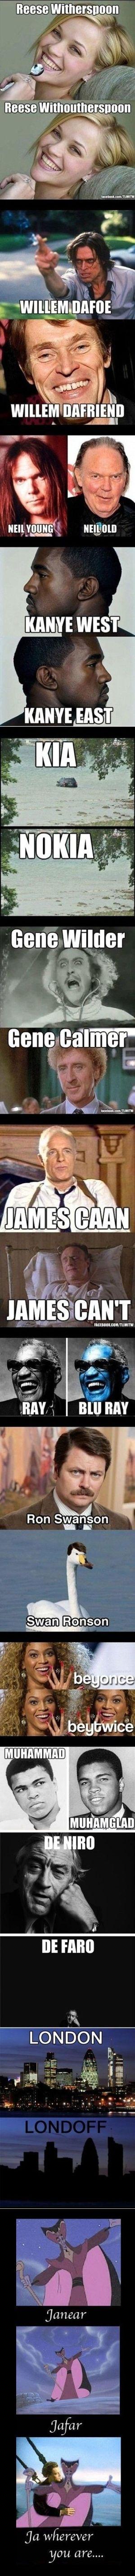 Hahahaha by lowercase rach